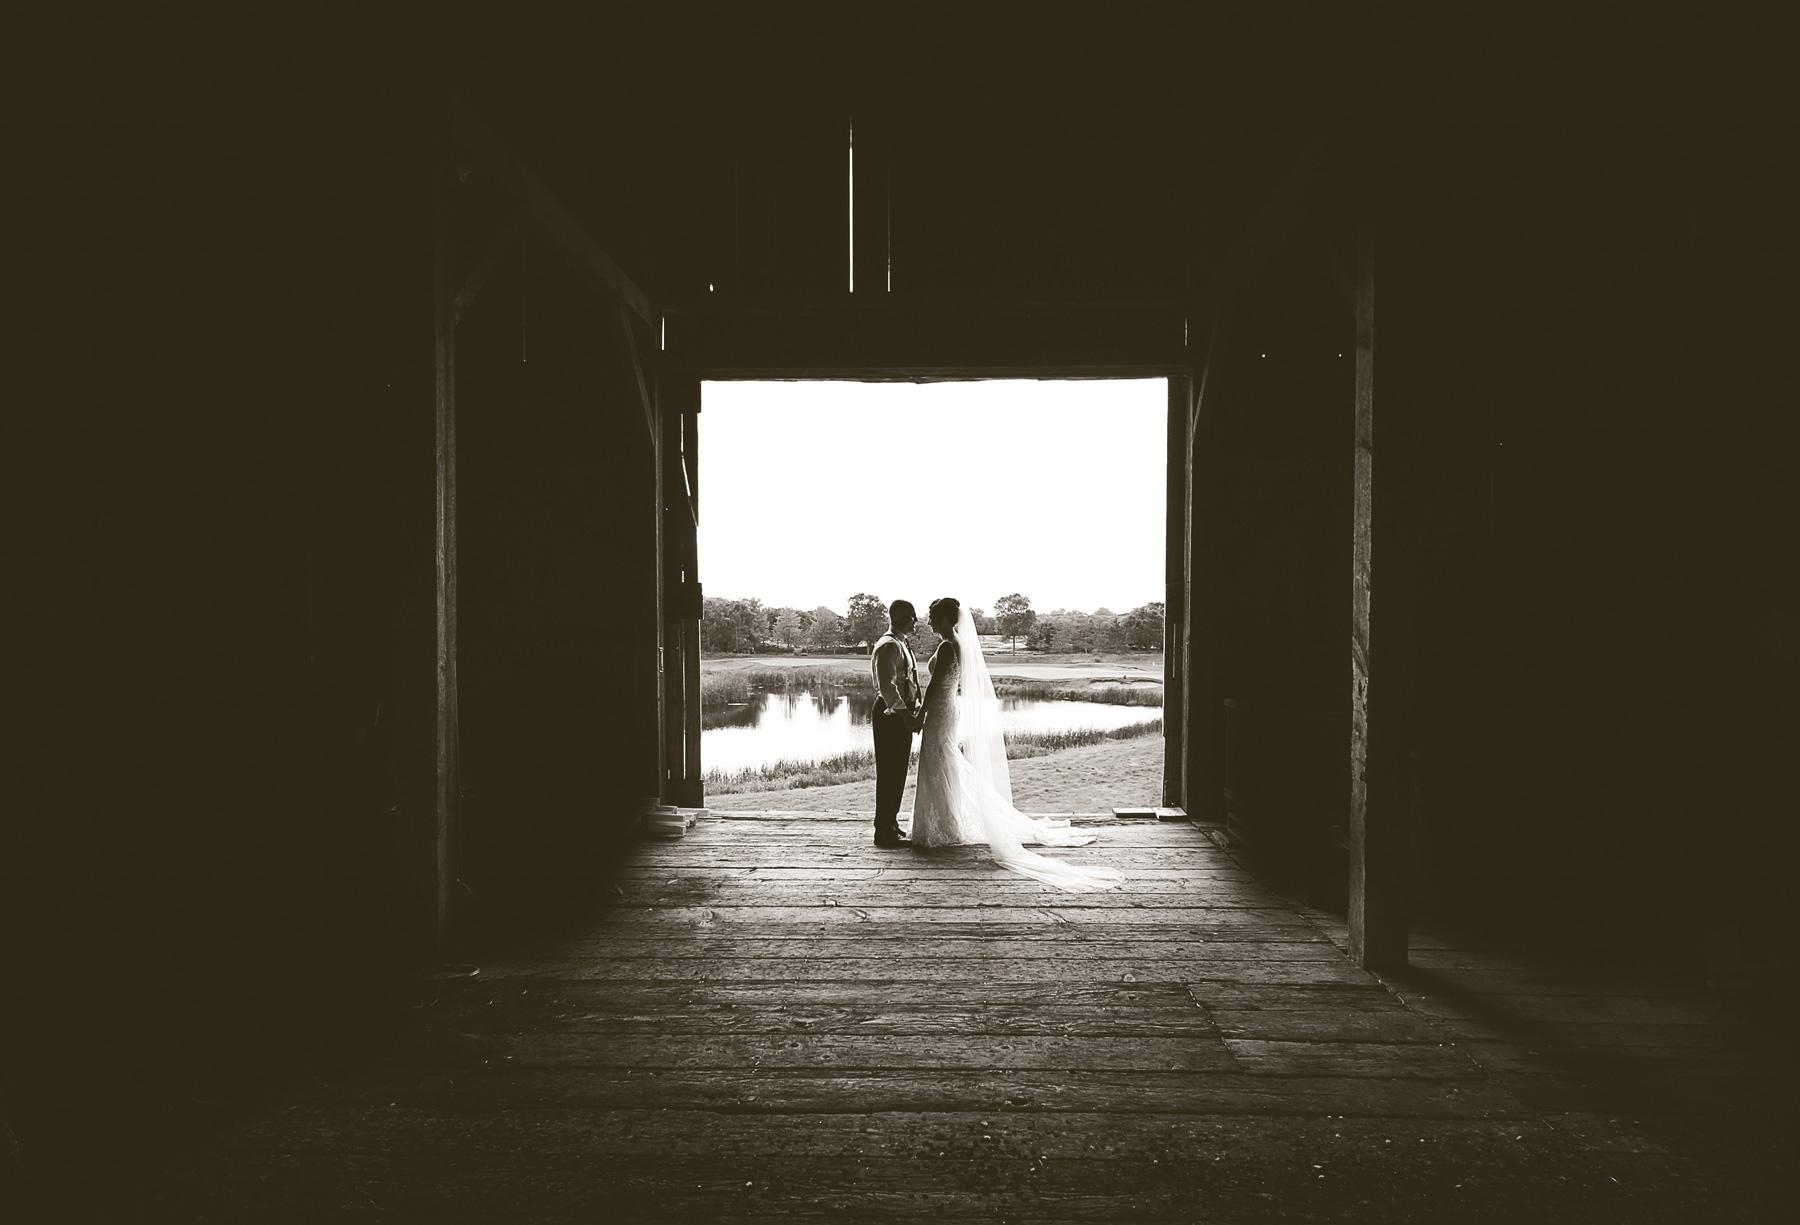 16-Stillwater-Minnesota-Wedding-Photography-by-Vick-Photography-Barn-Rustic-Tara-&-Ryan.jpg